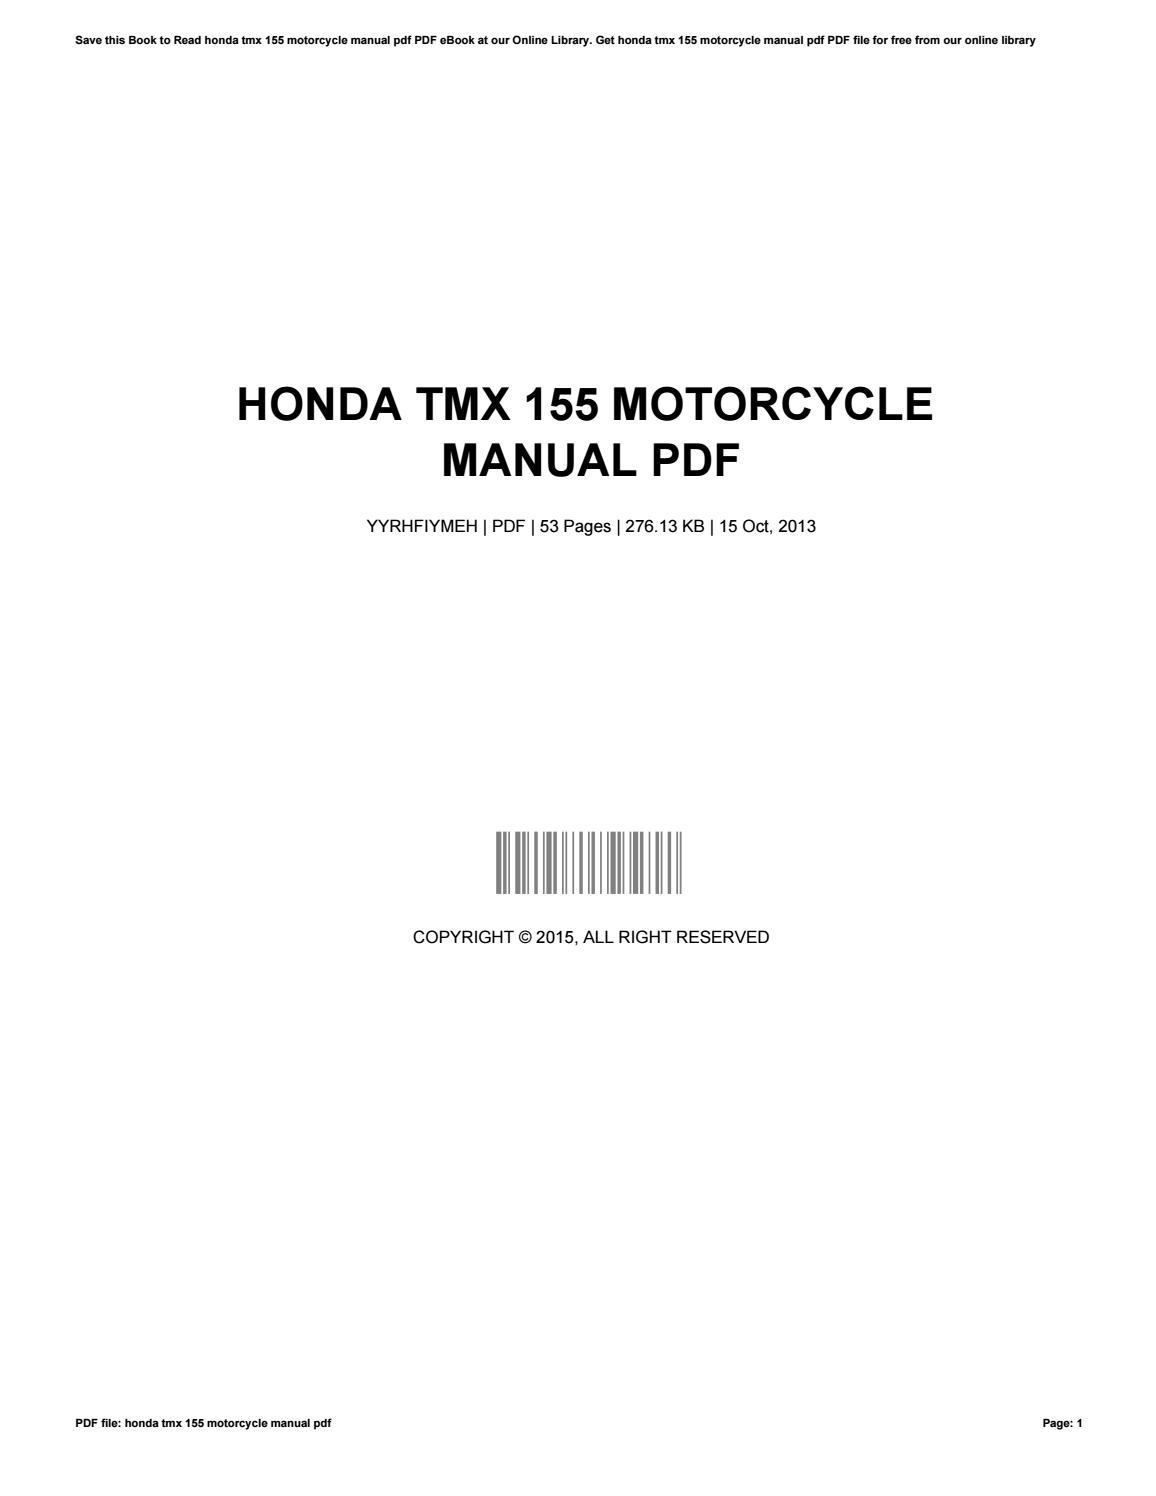 Honda Tmx 155 Motorcycle Manual Pdf By Josephladd1616 Issuu